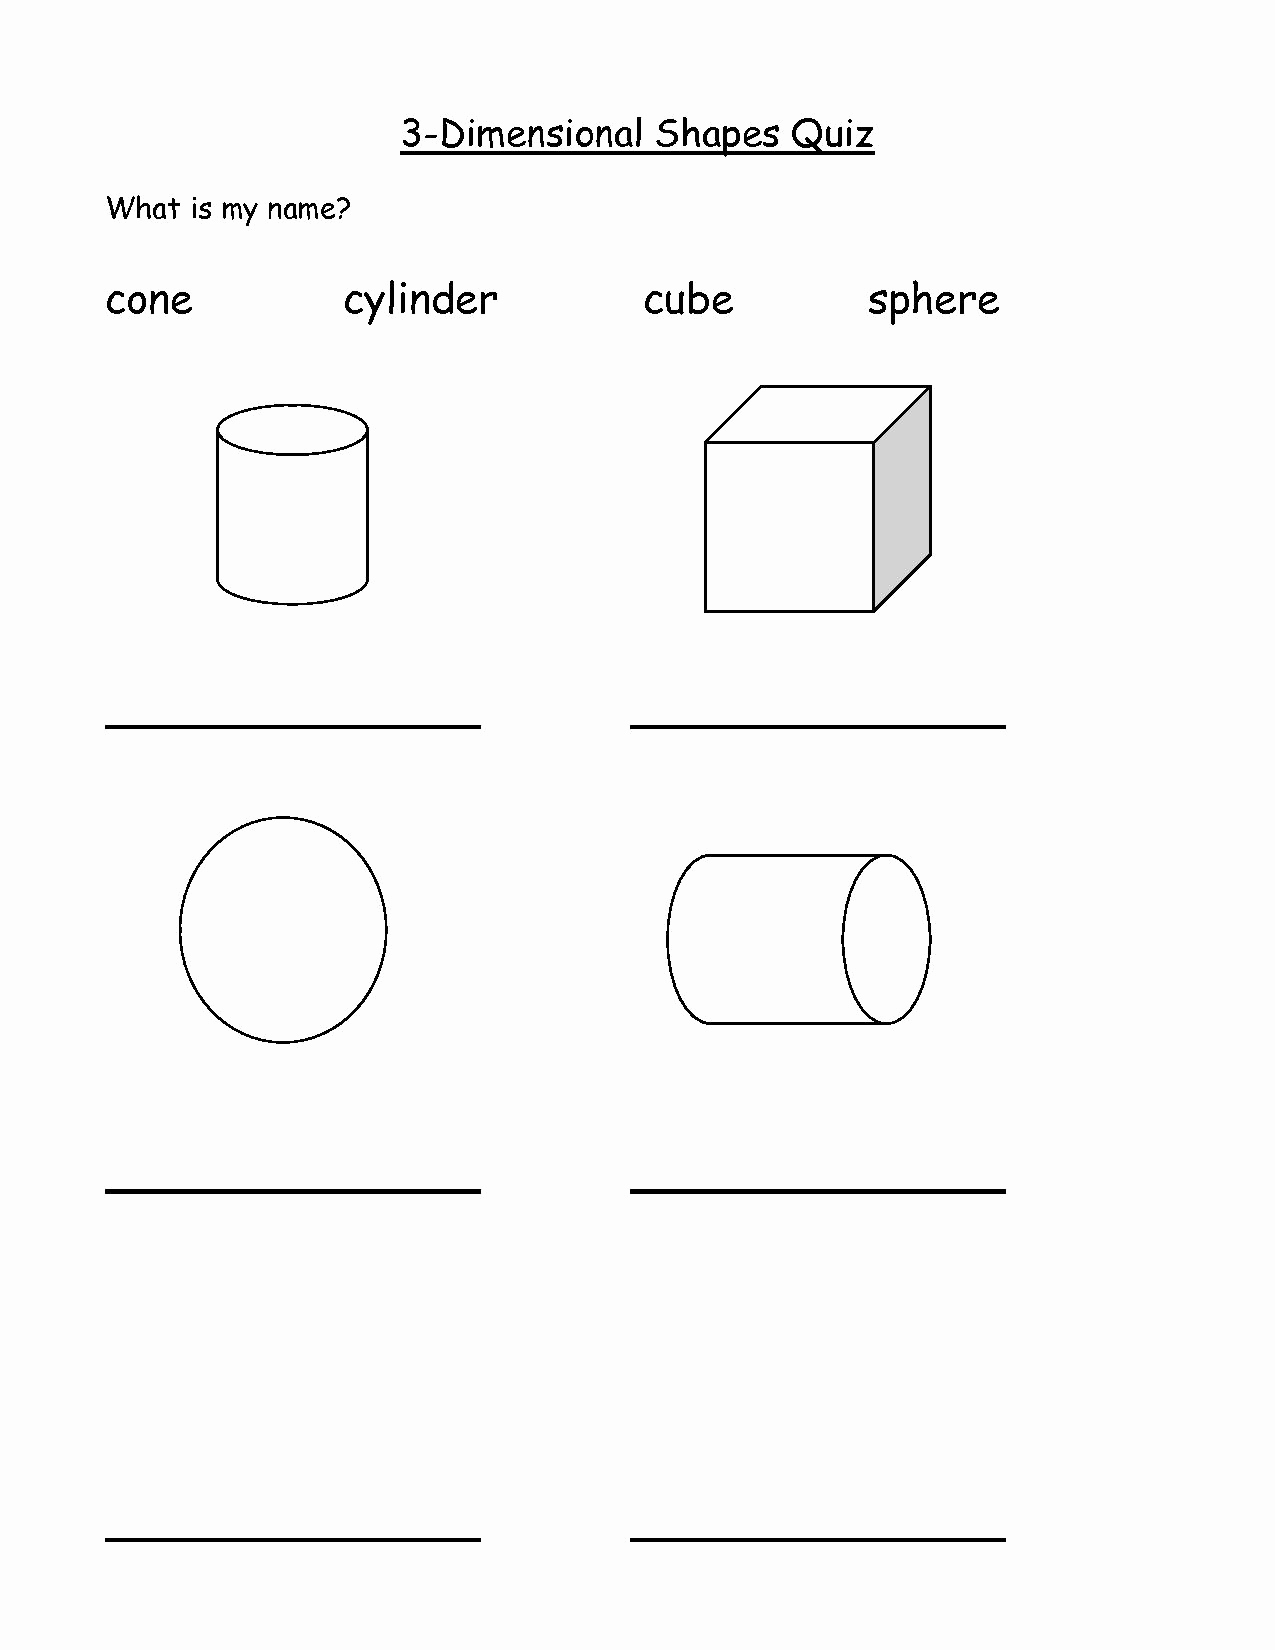 3 Dimensional Shapes Worksheet Fresh 12 Best Of 3 Dimensional Shape Worksheets Printable